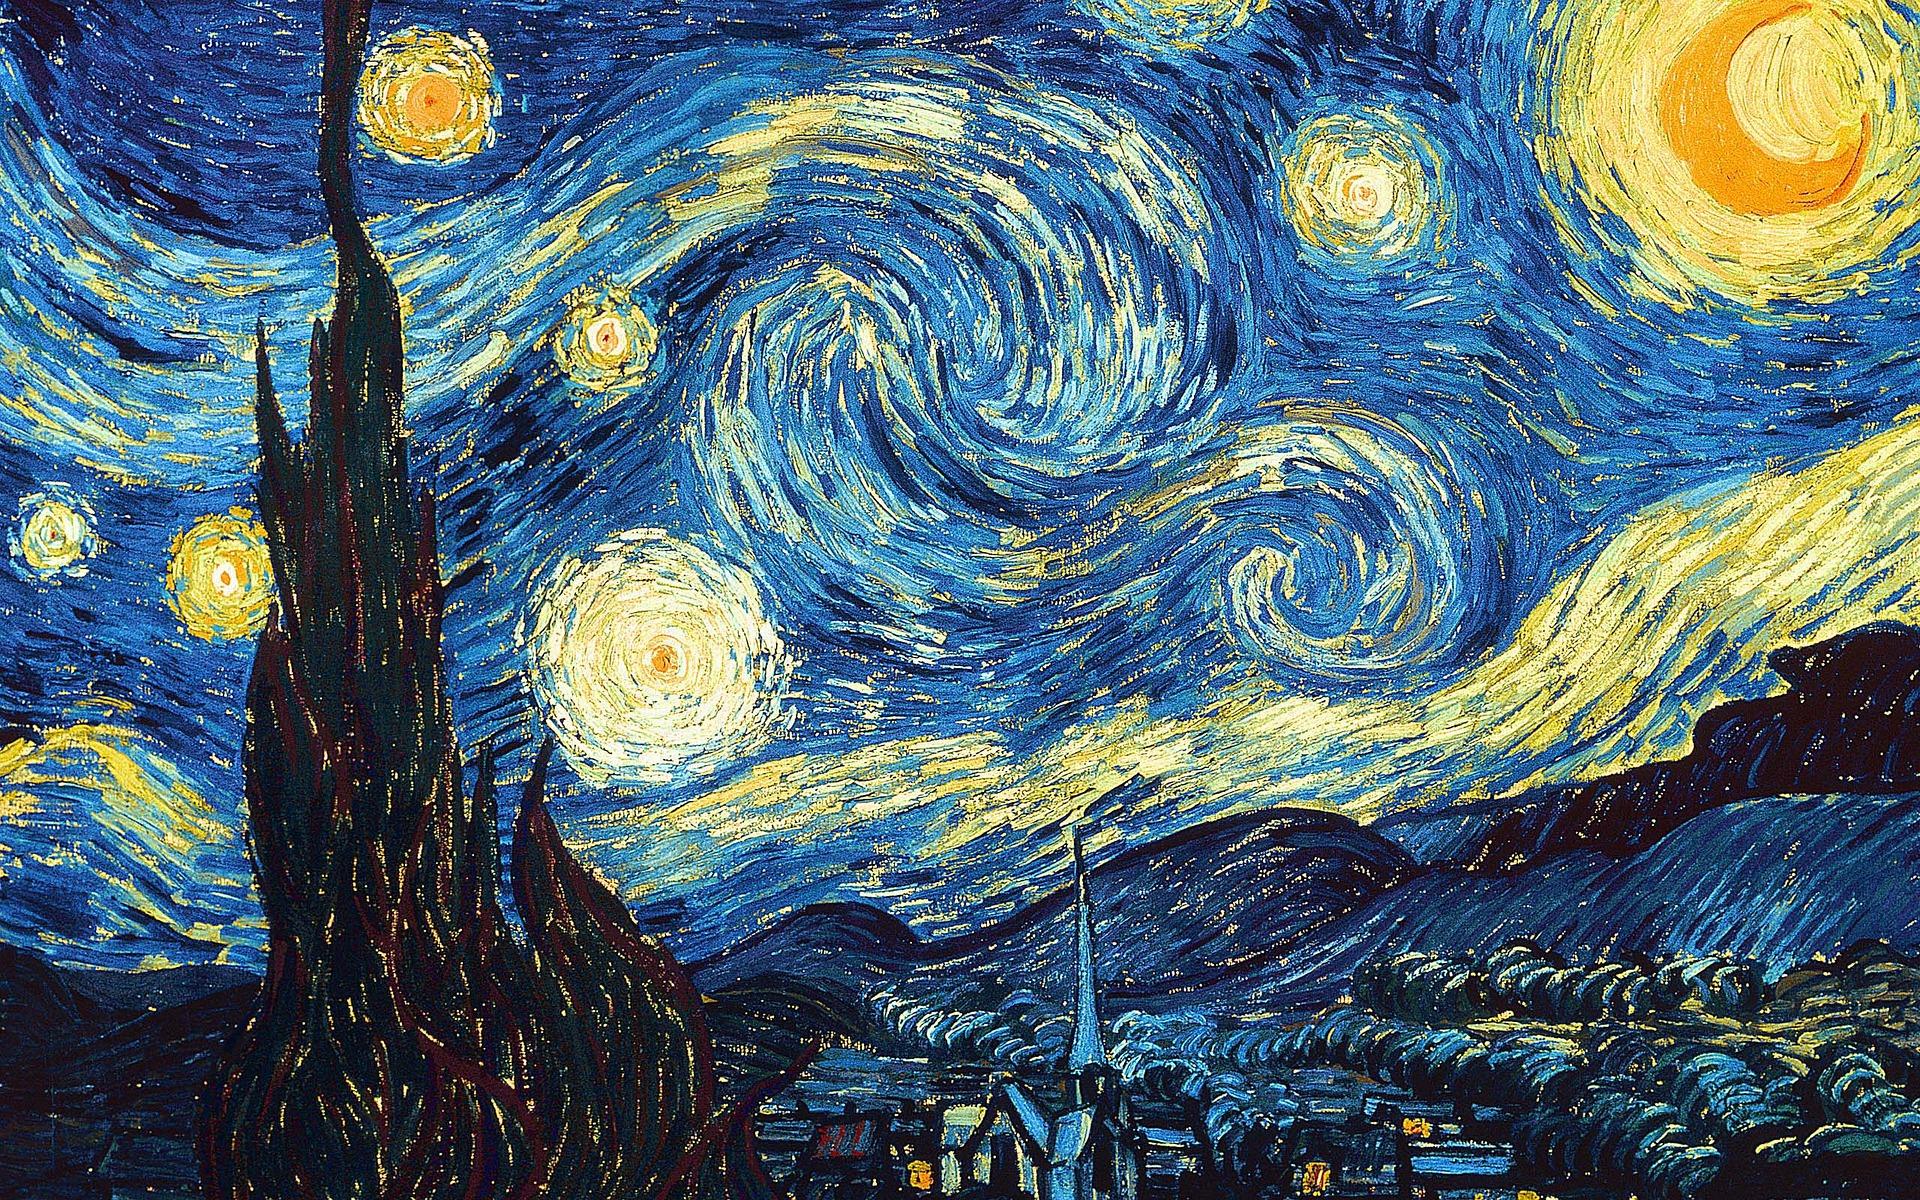 NC: Учеными из США определена формула успеха картин Ван Гога